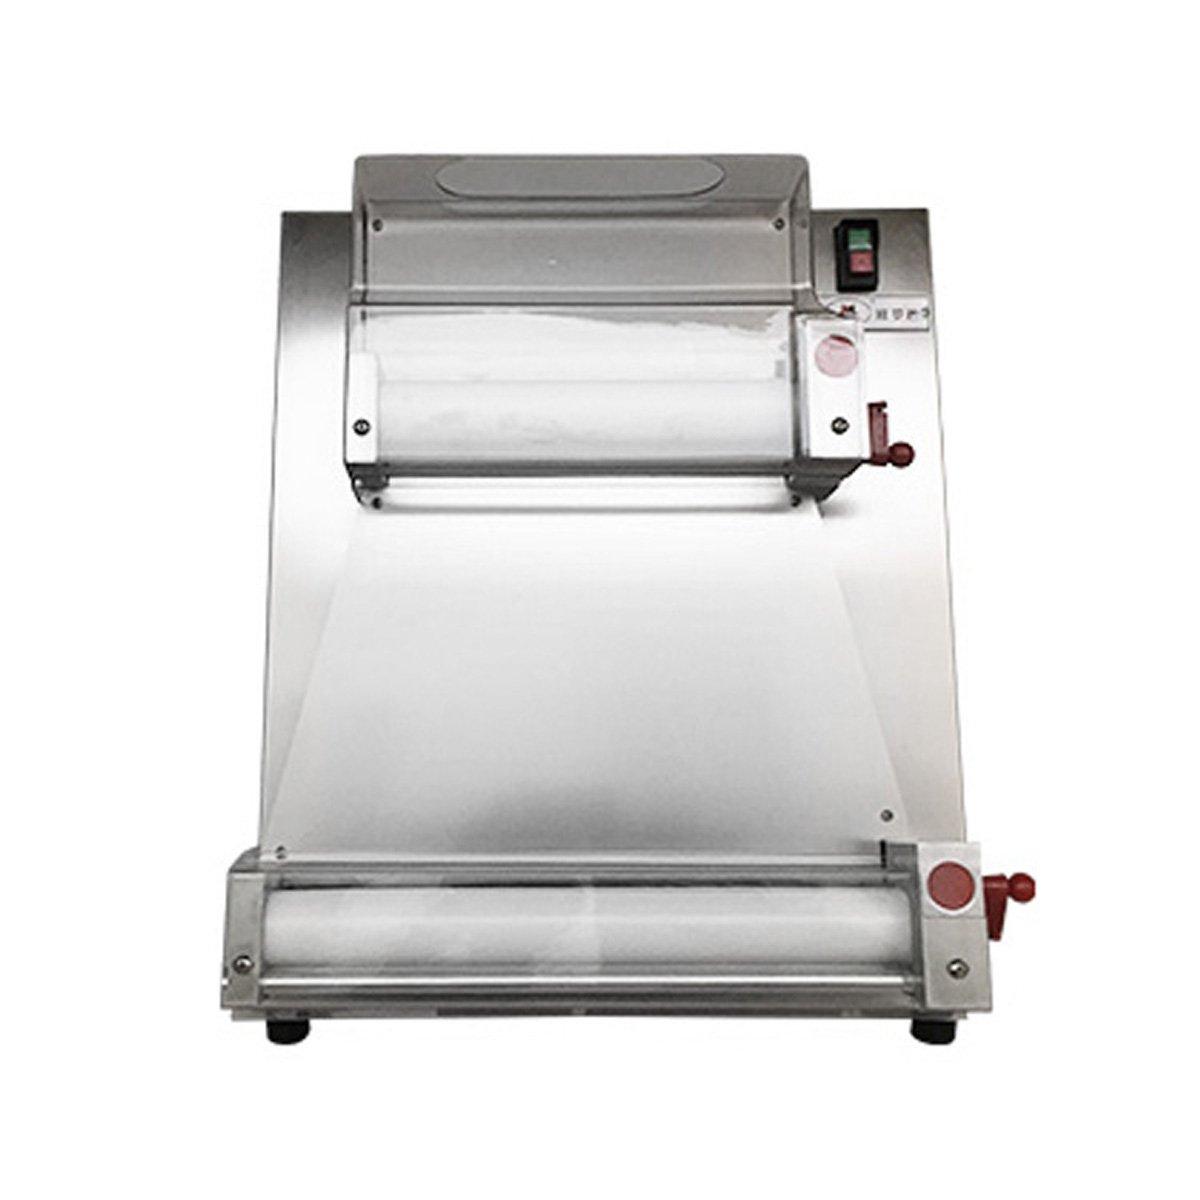 Automático Pizza rodillo de masa hojeadora machine-pizza Panificadora, 370 W/110 V: Amazon.es: Hogar